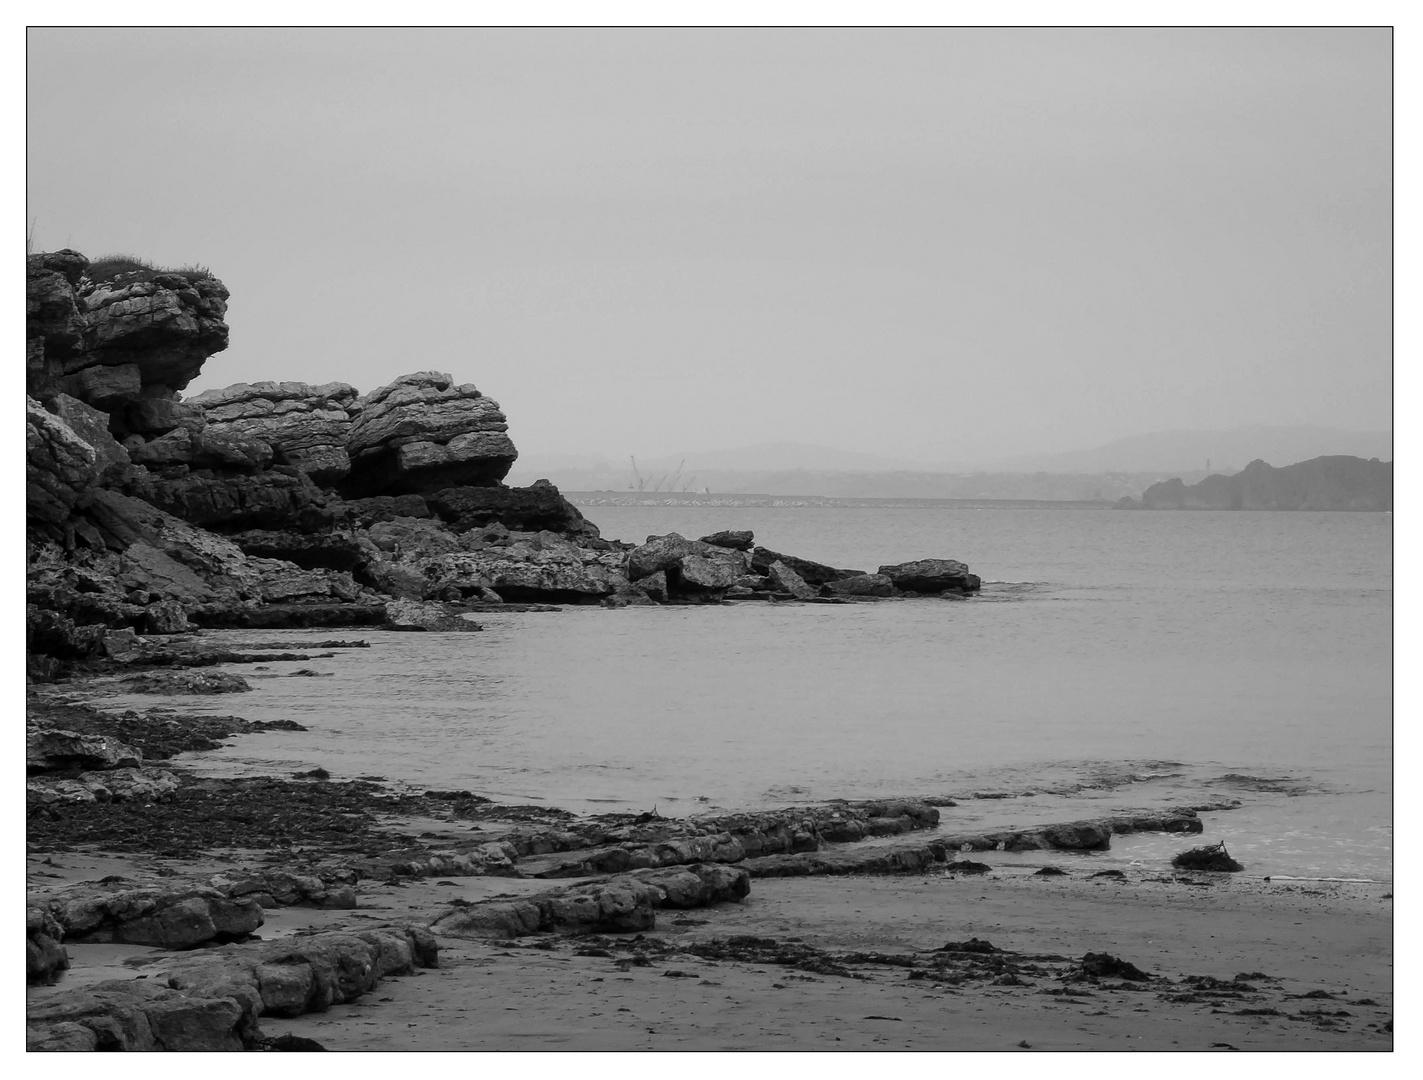 Playa de Antromero